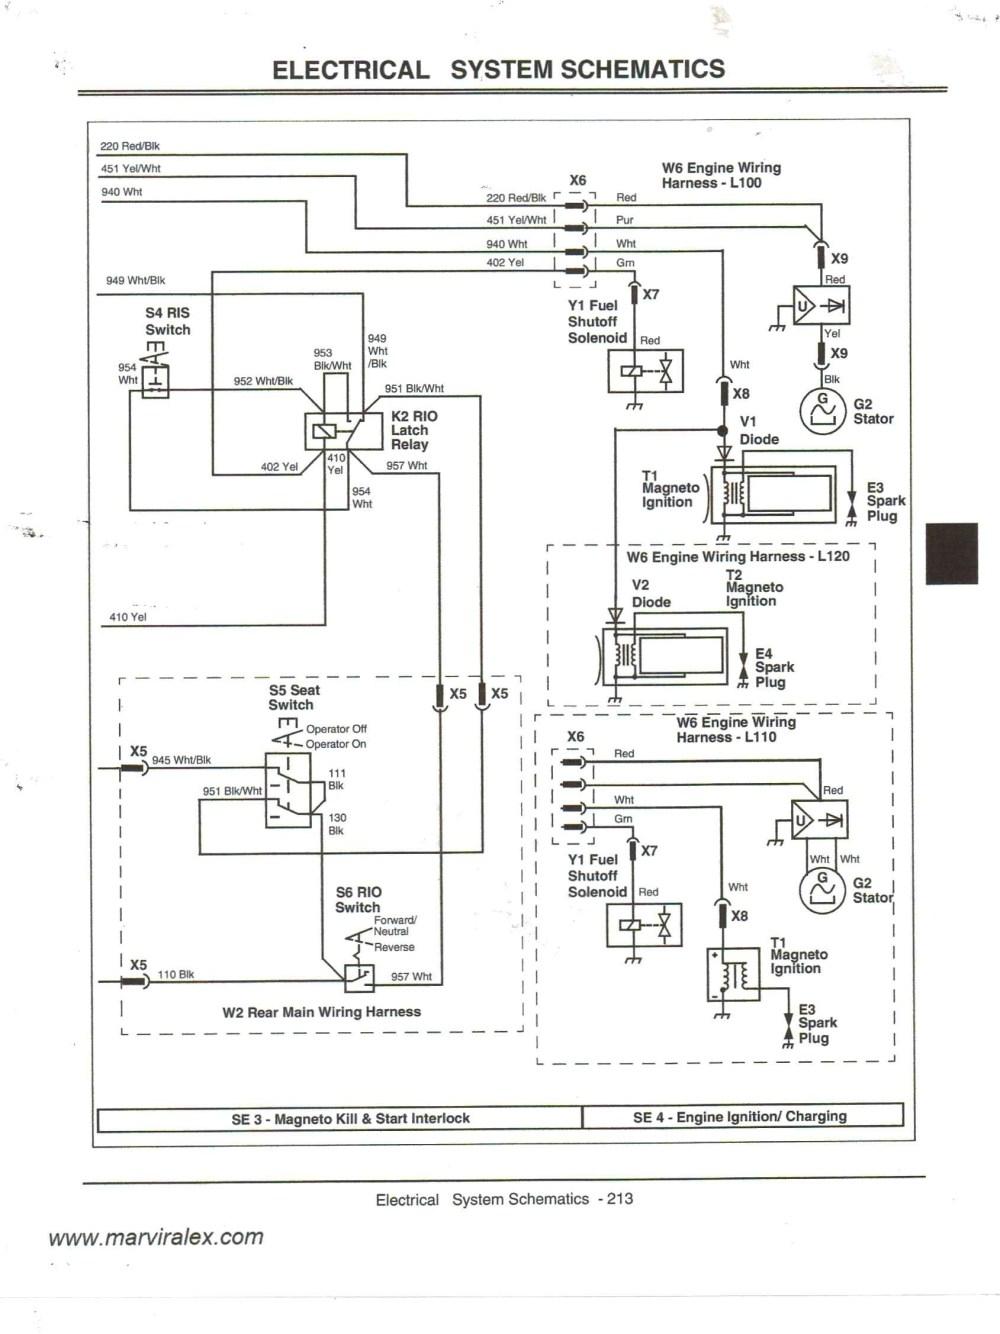 medium resolution of jd 410 engine wiring diagram wiring diagrams wni john deere 410 wiring diagram